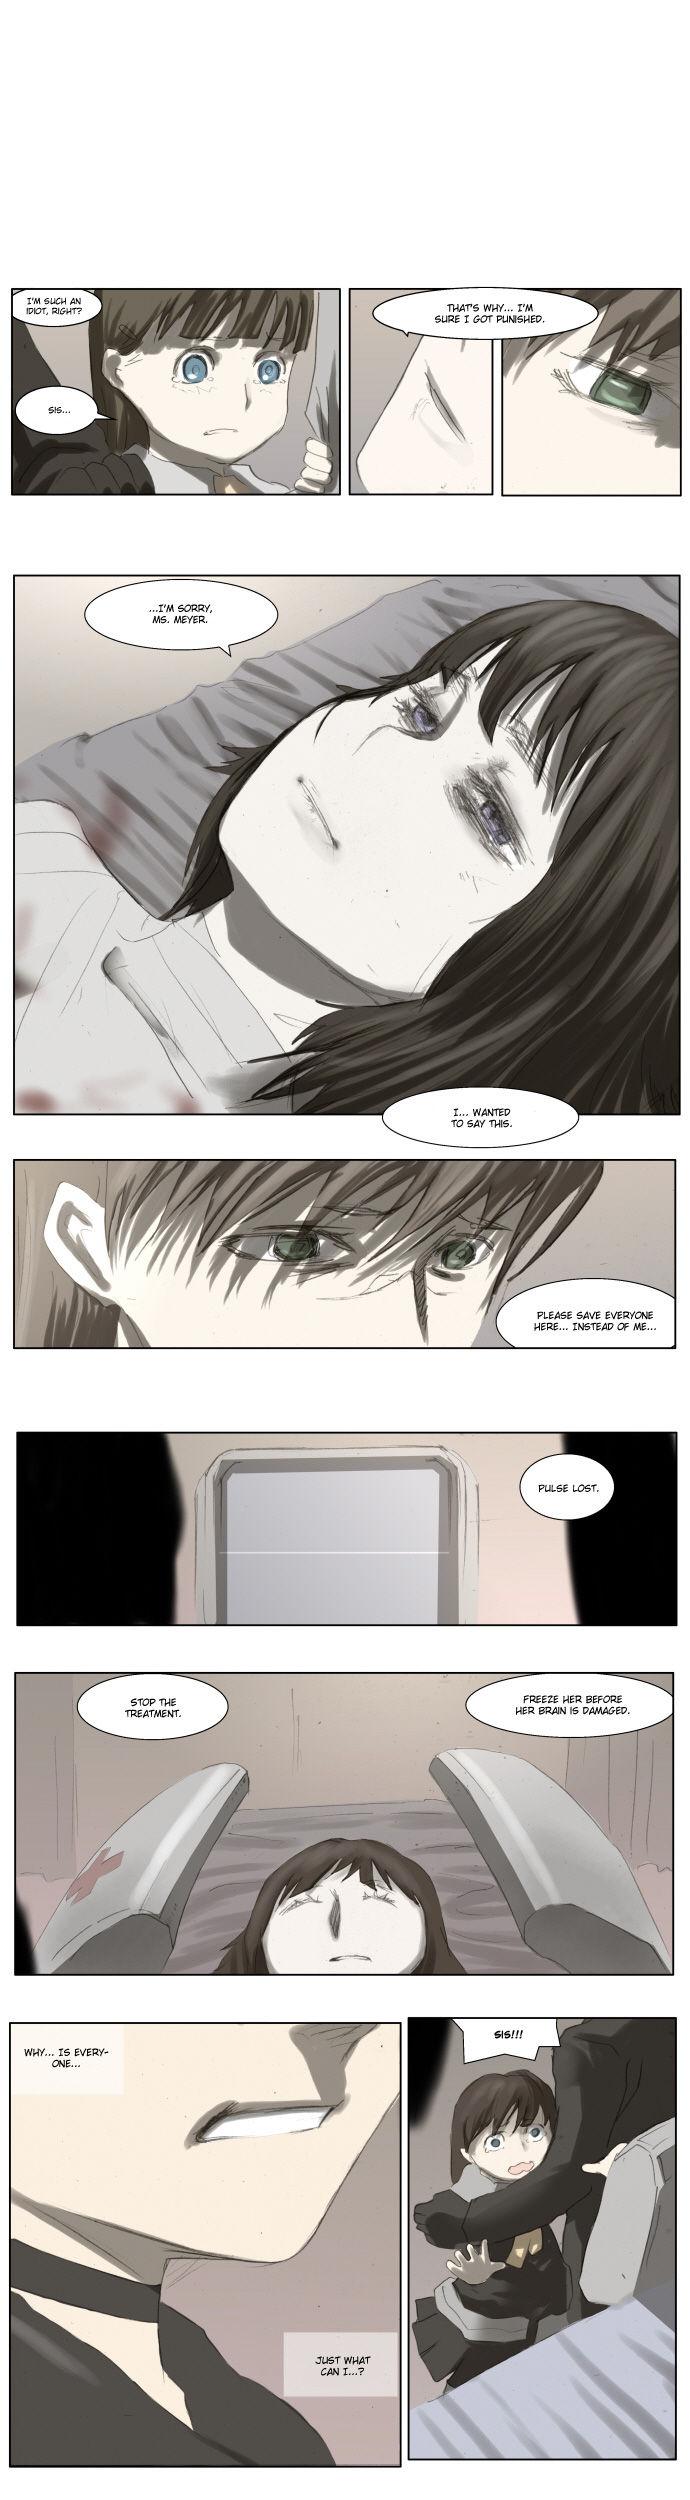 Knight Run 43 Page 2